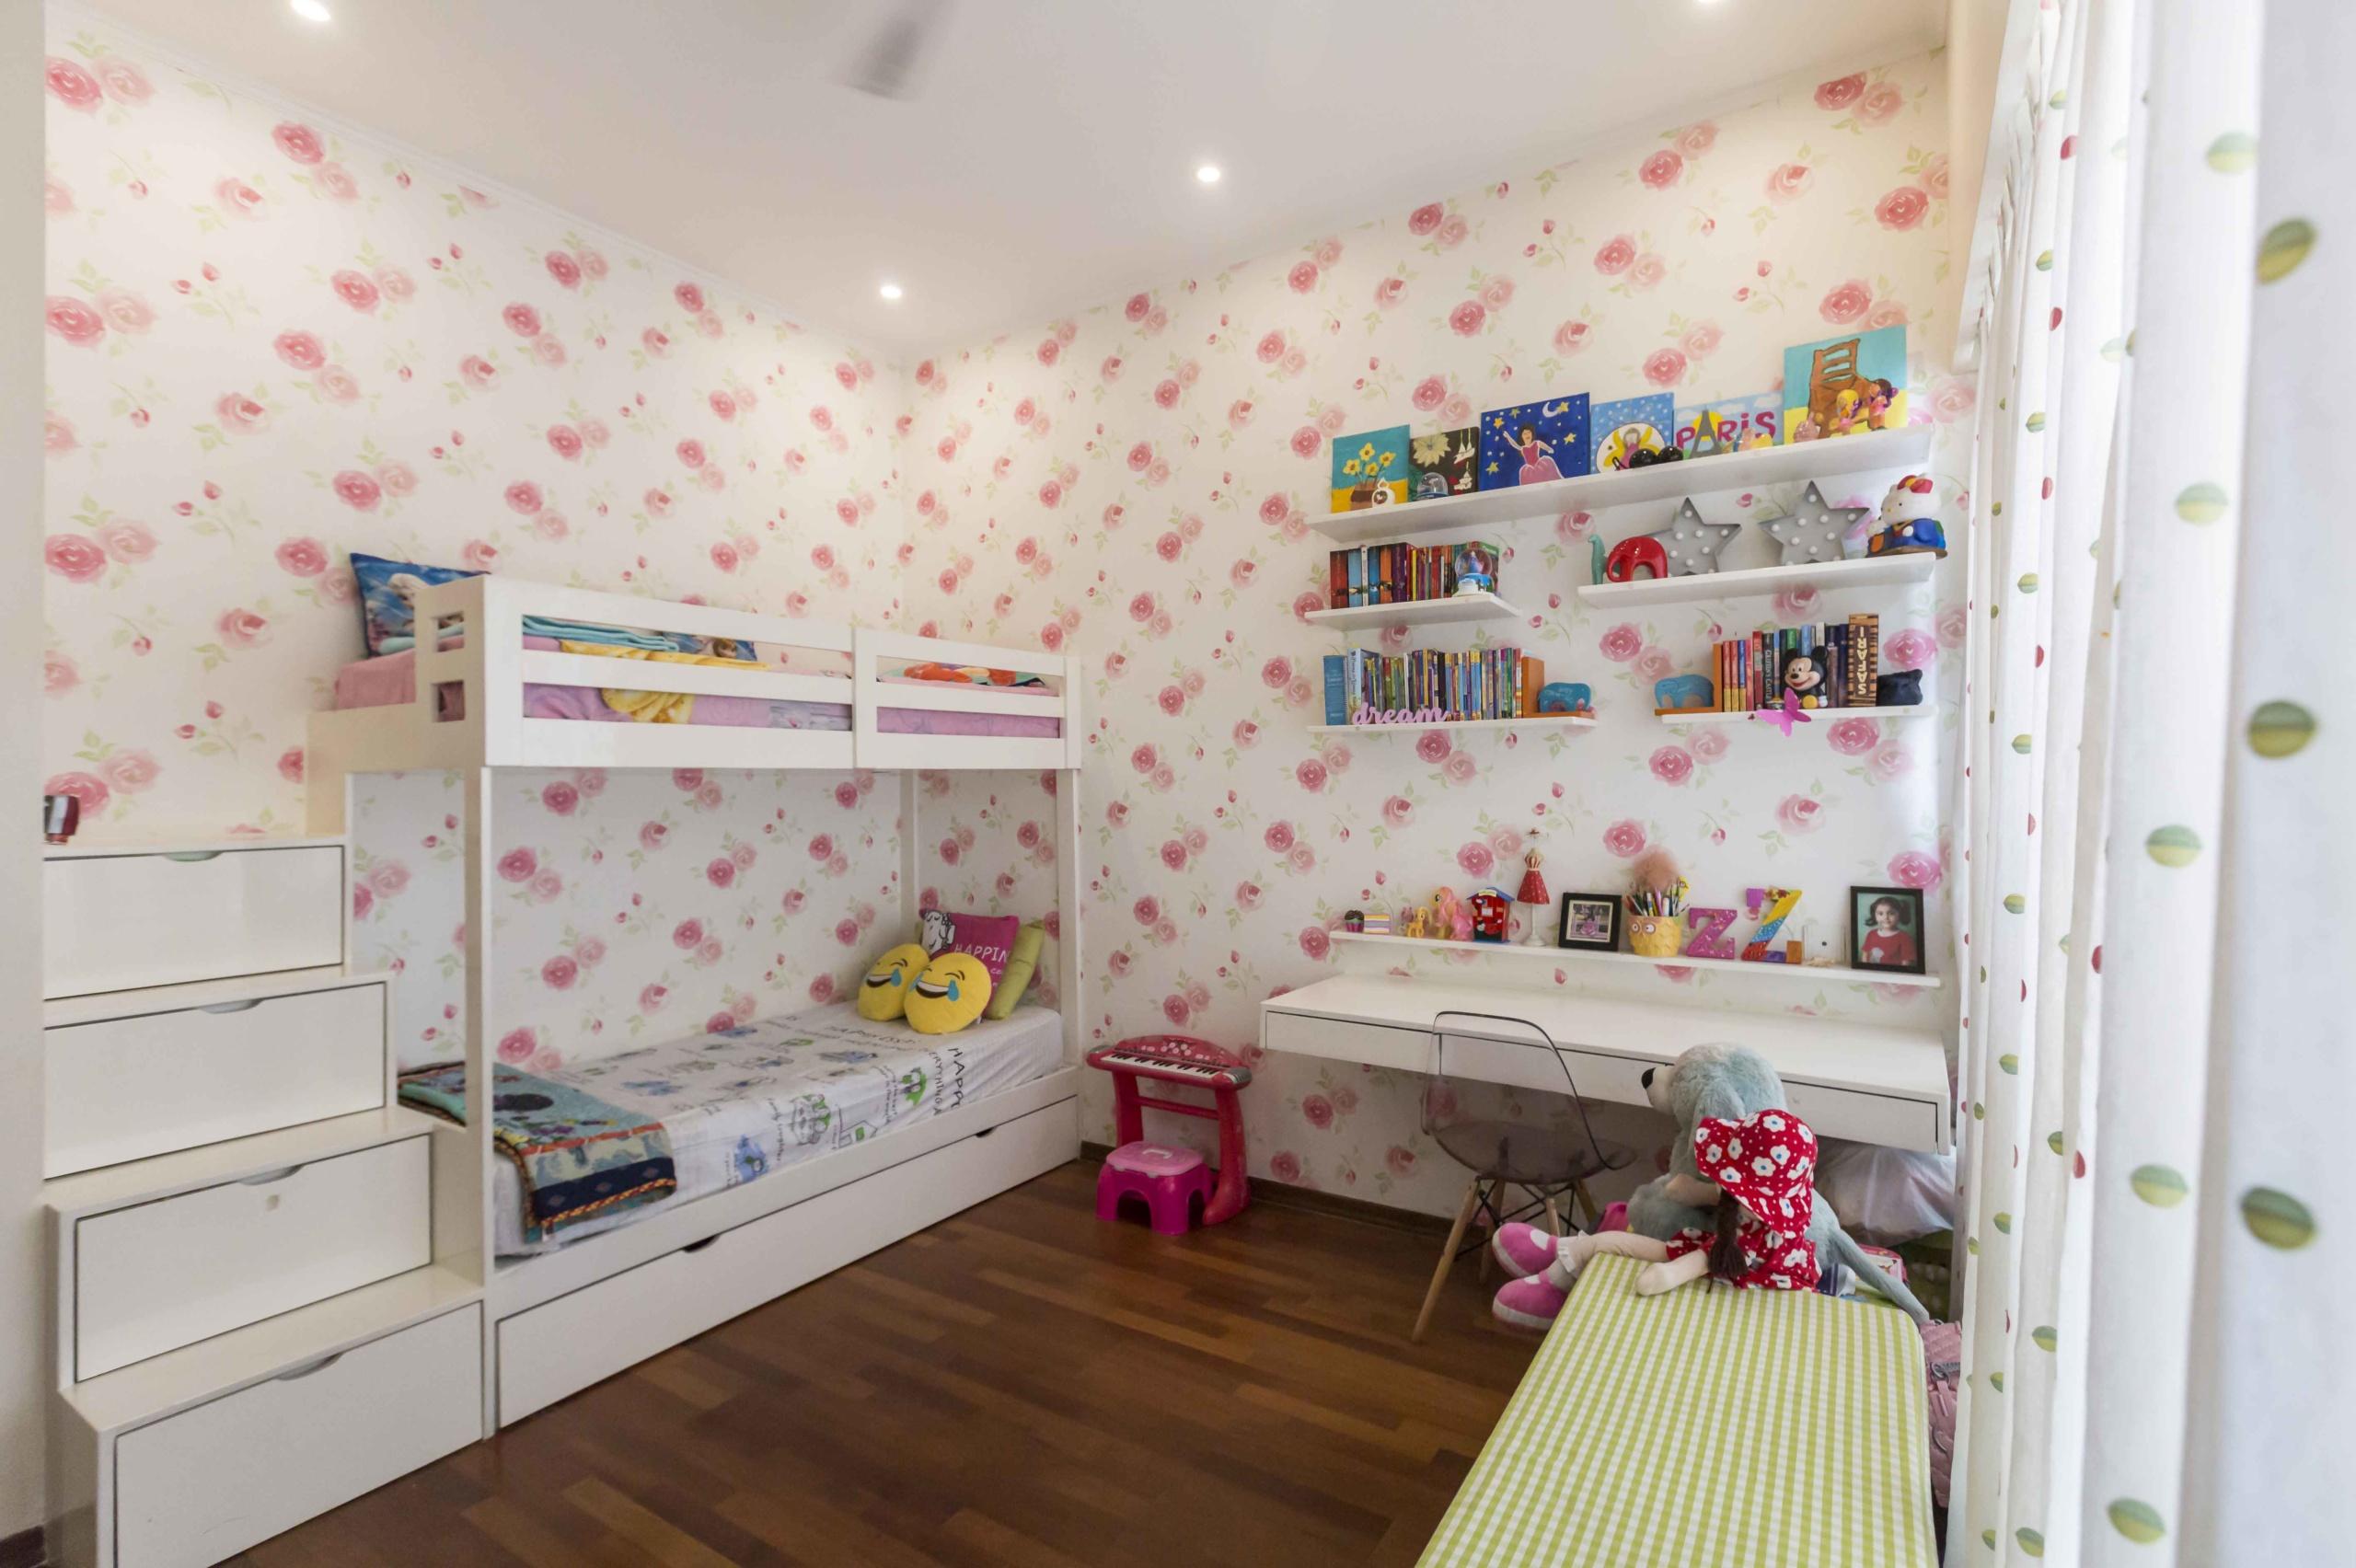 Quirk Studio kid's room storage